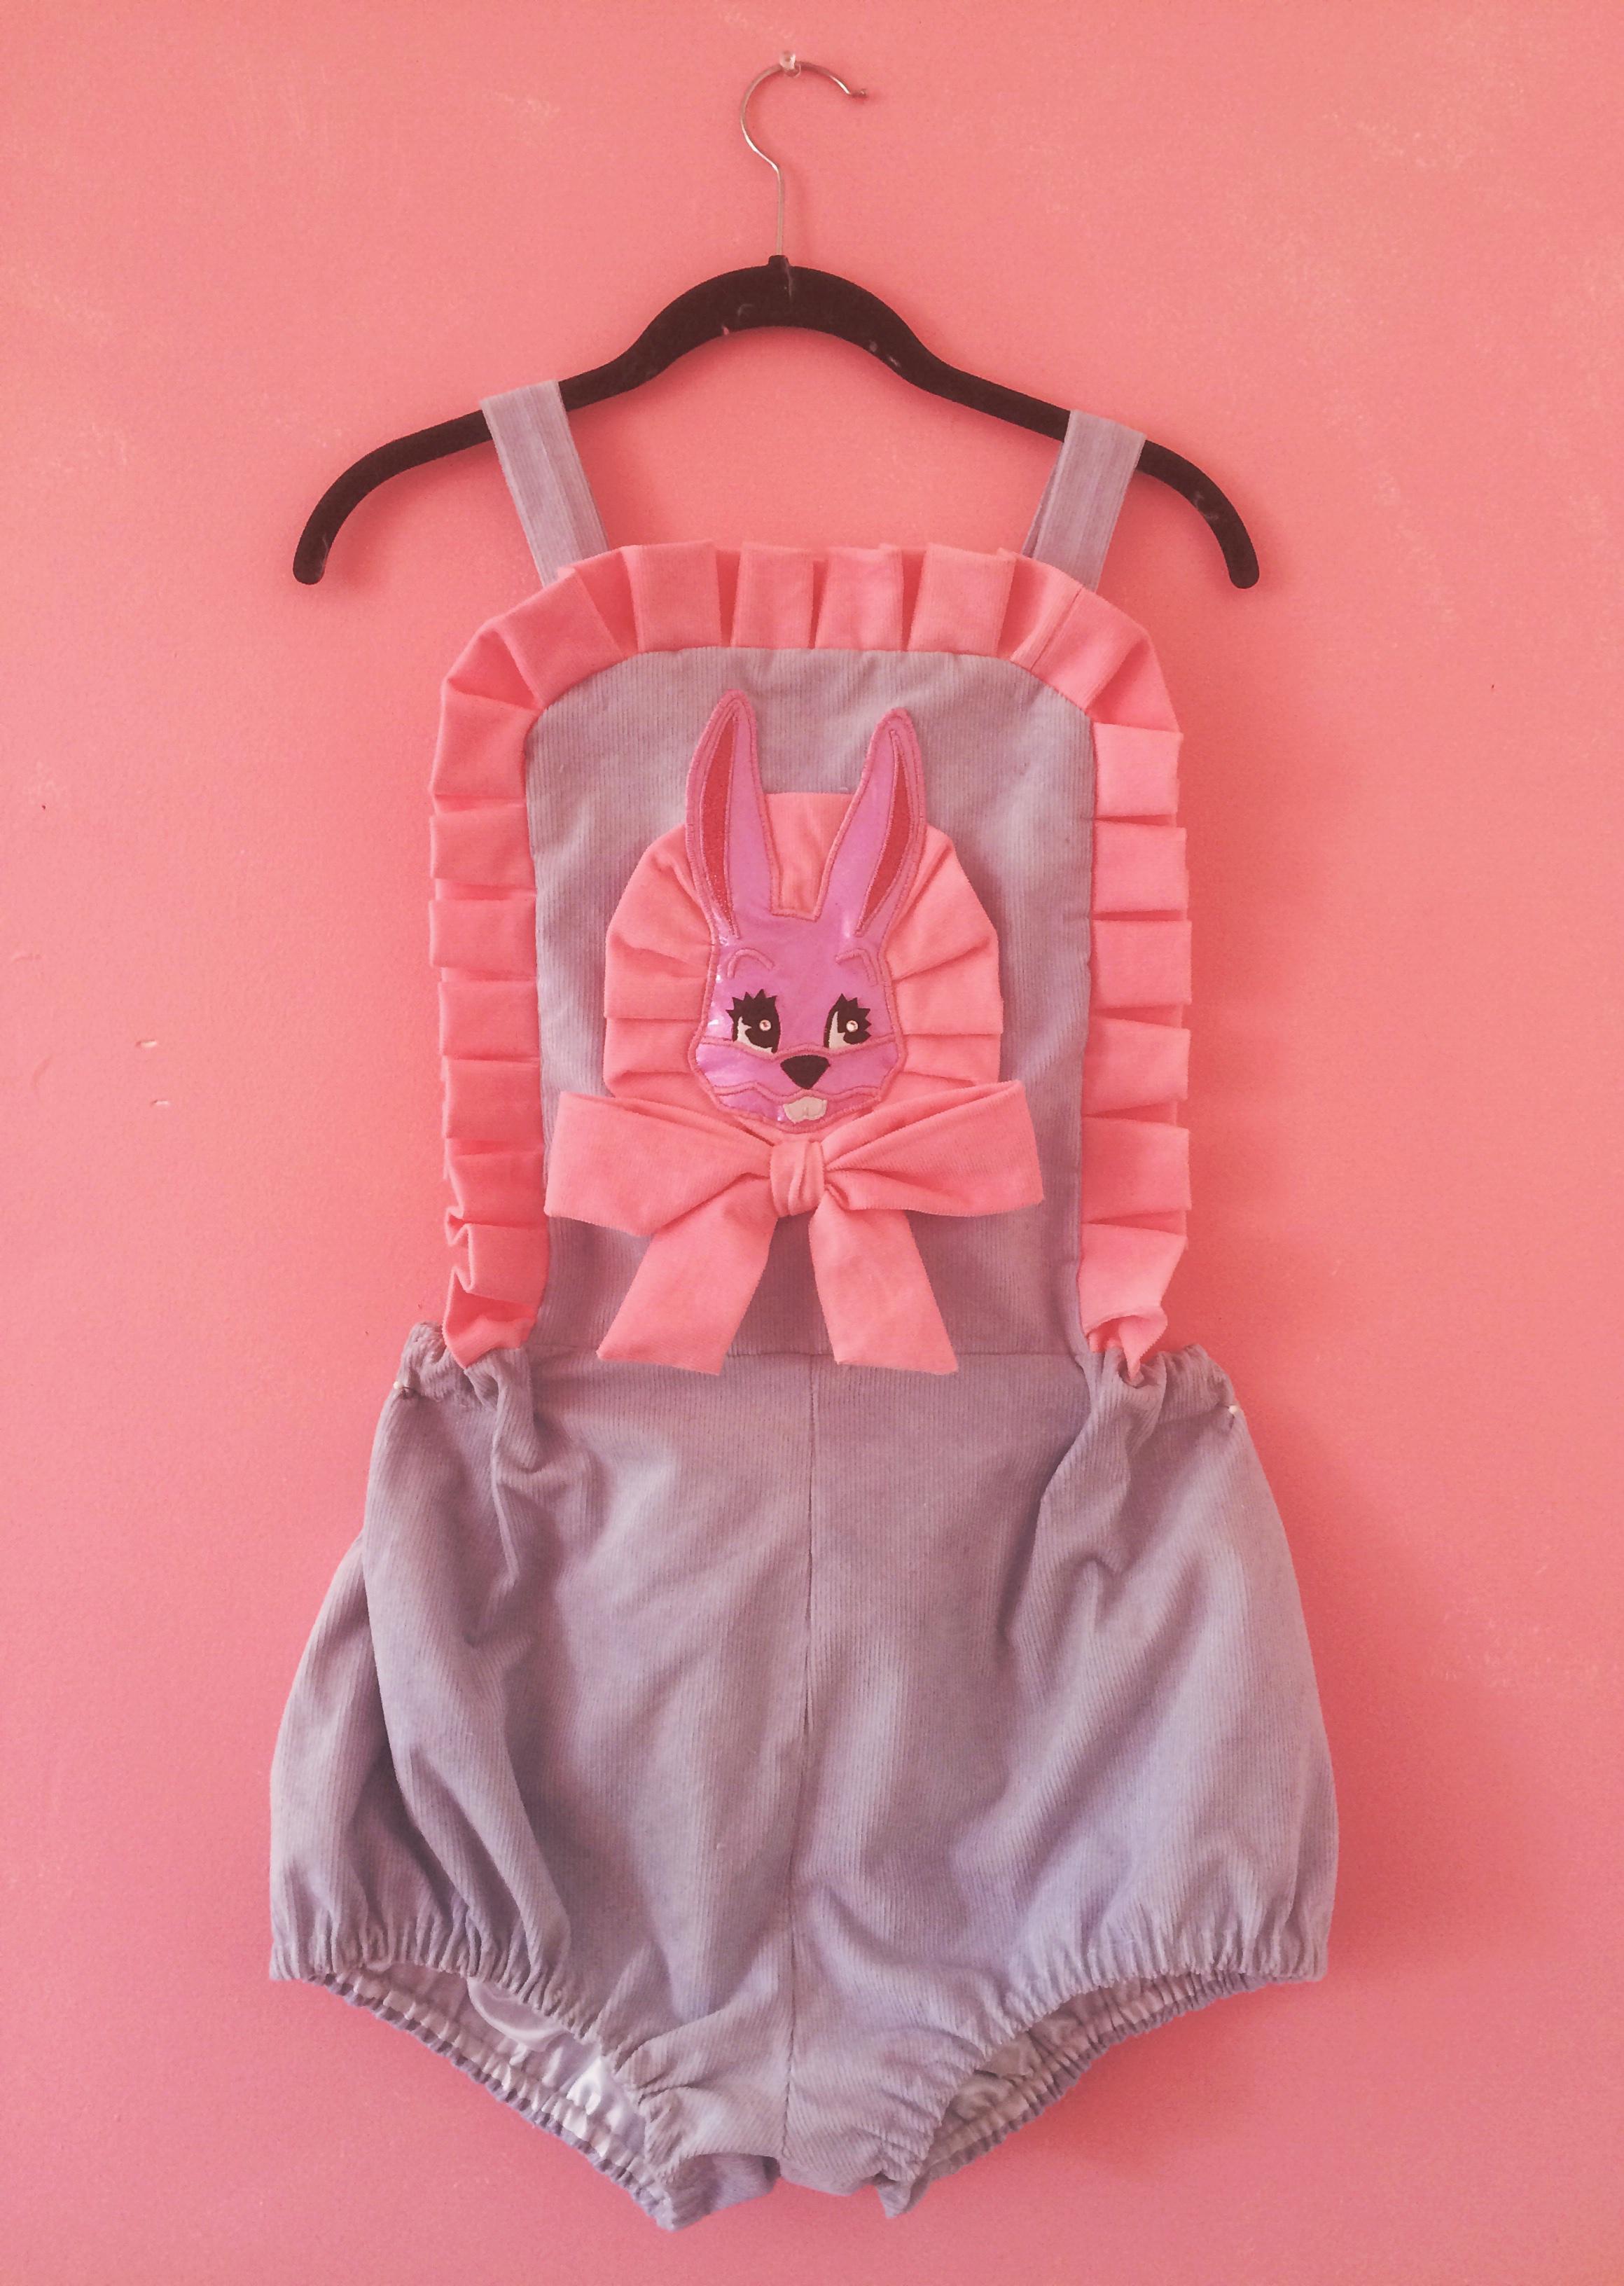 2016 Hand Dyed Corduroy Bunny Applique Romper (custom order)